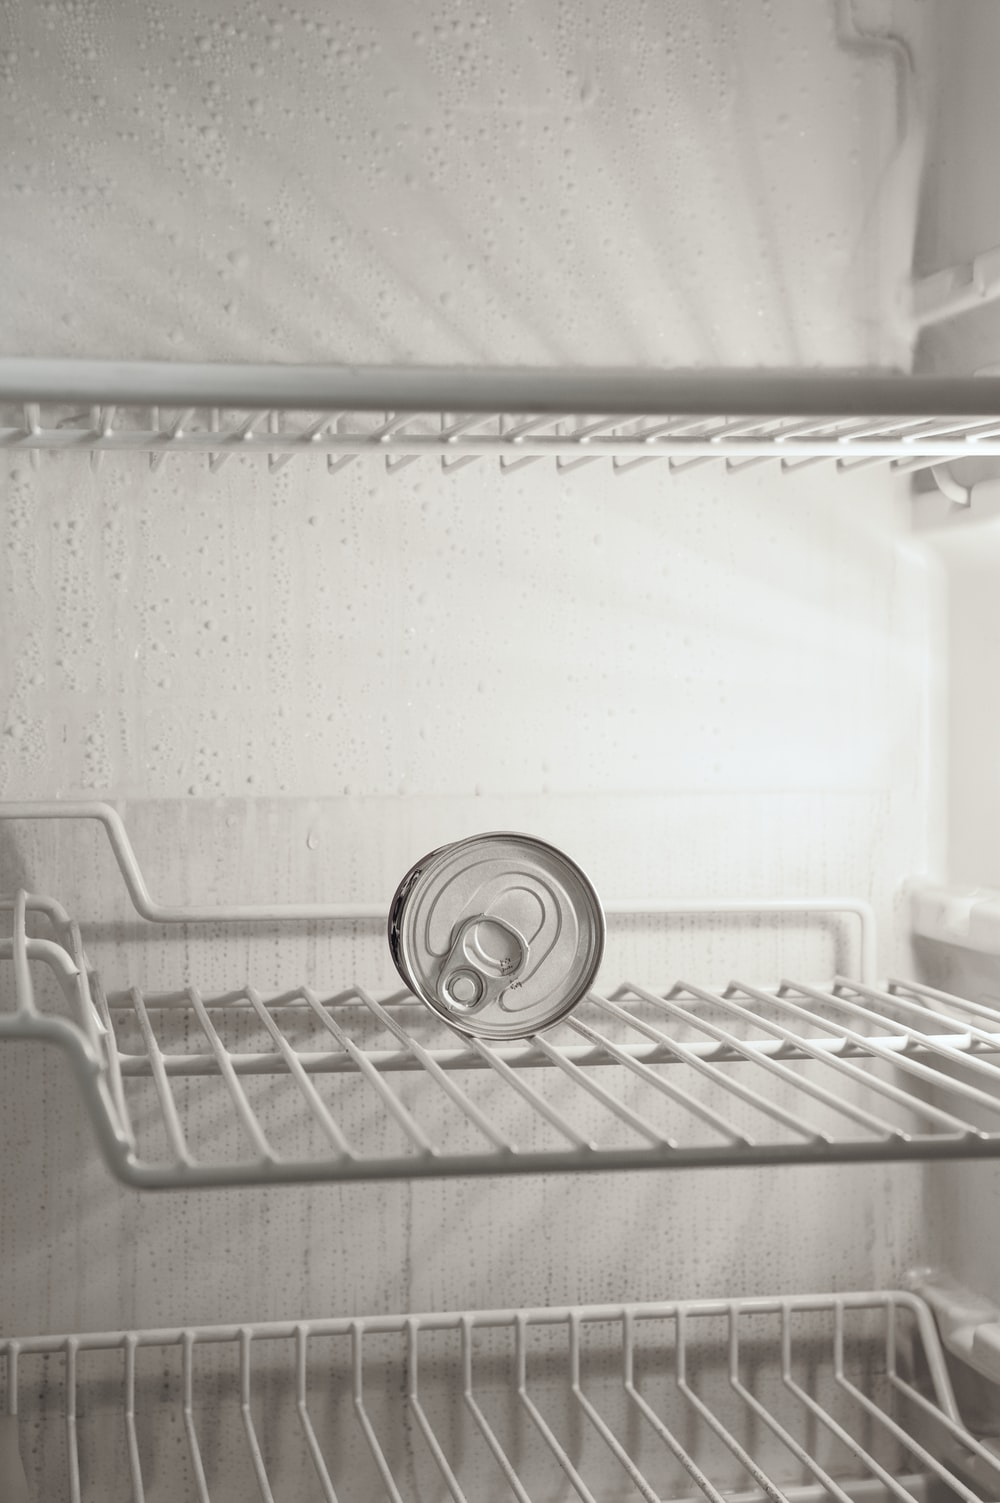 beverage can in refrigerato